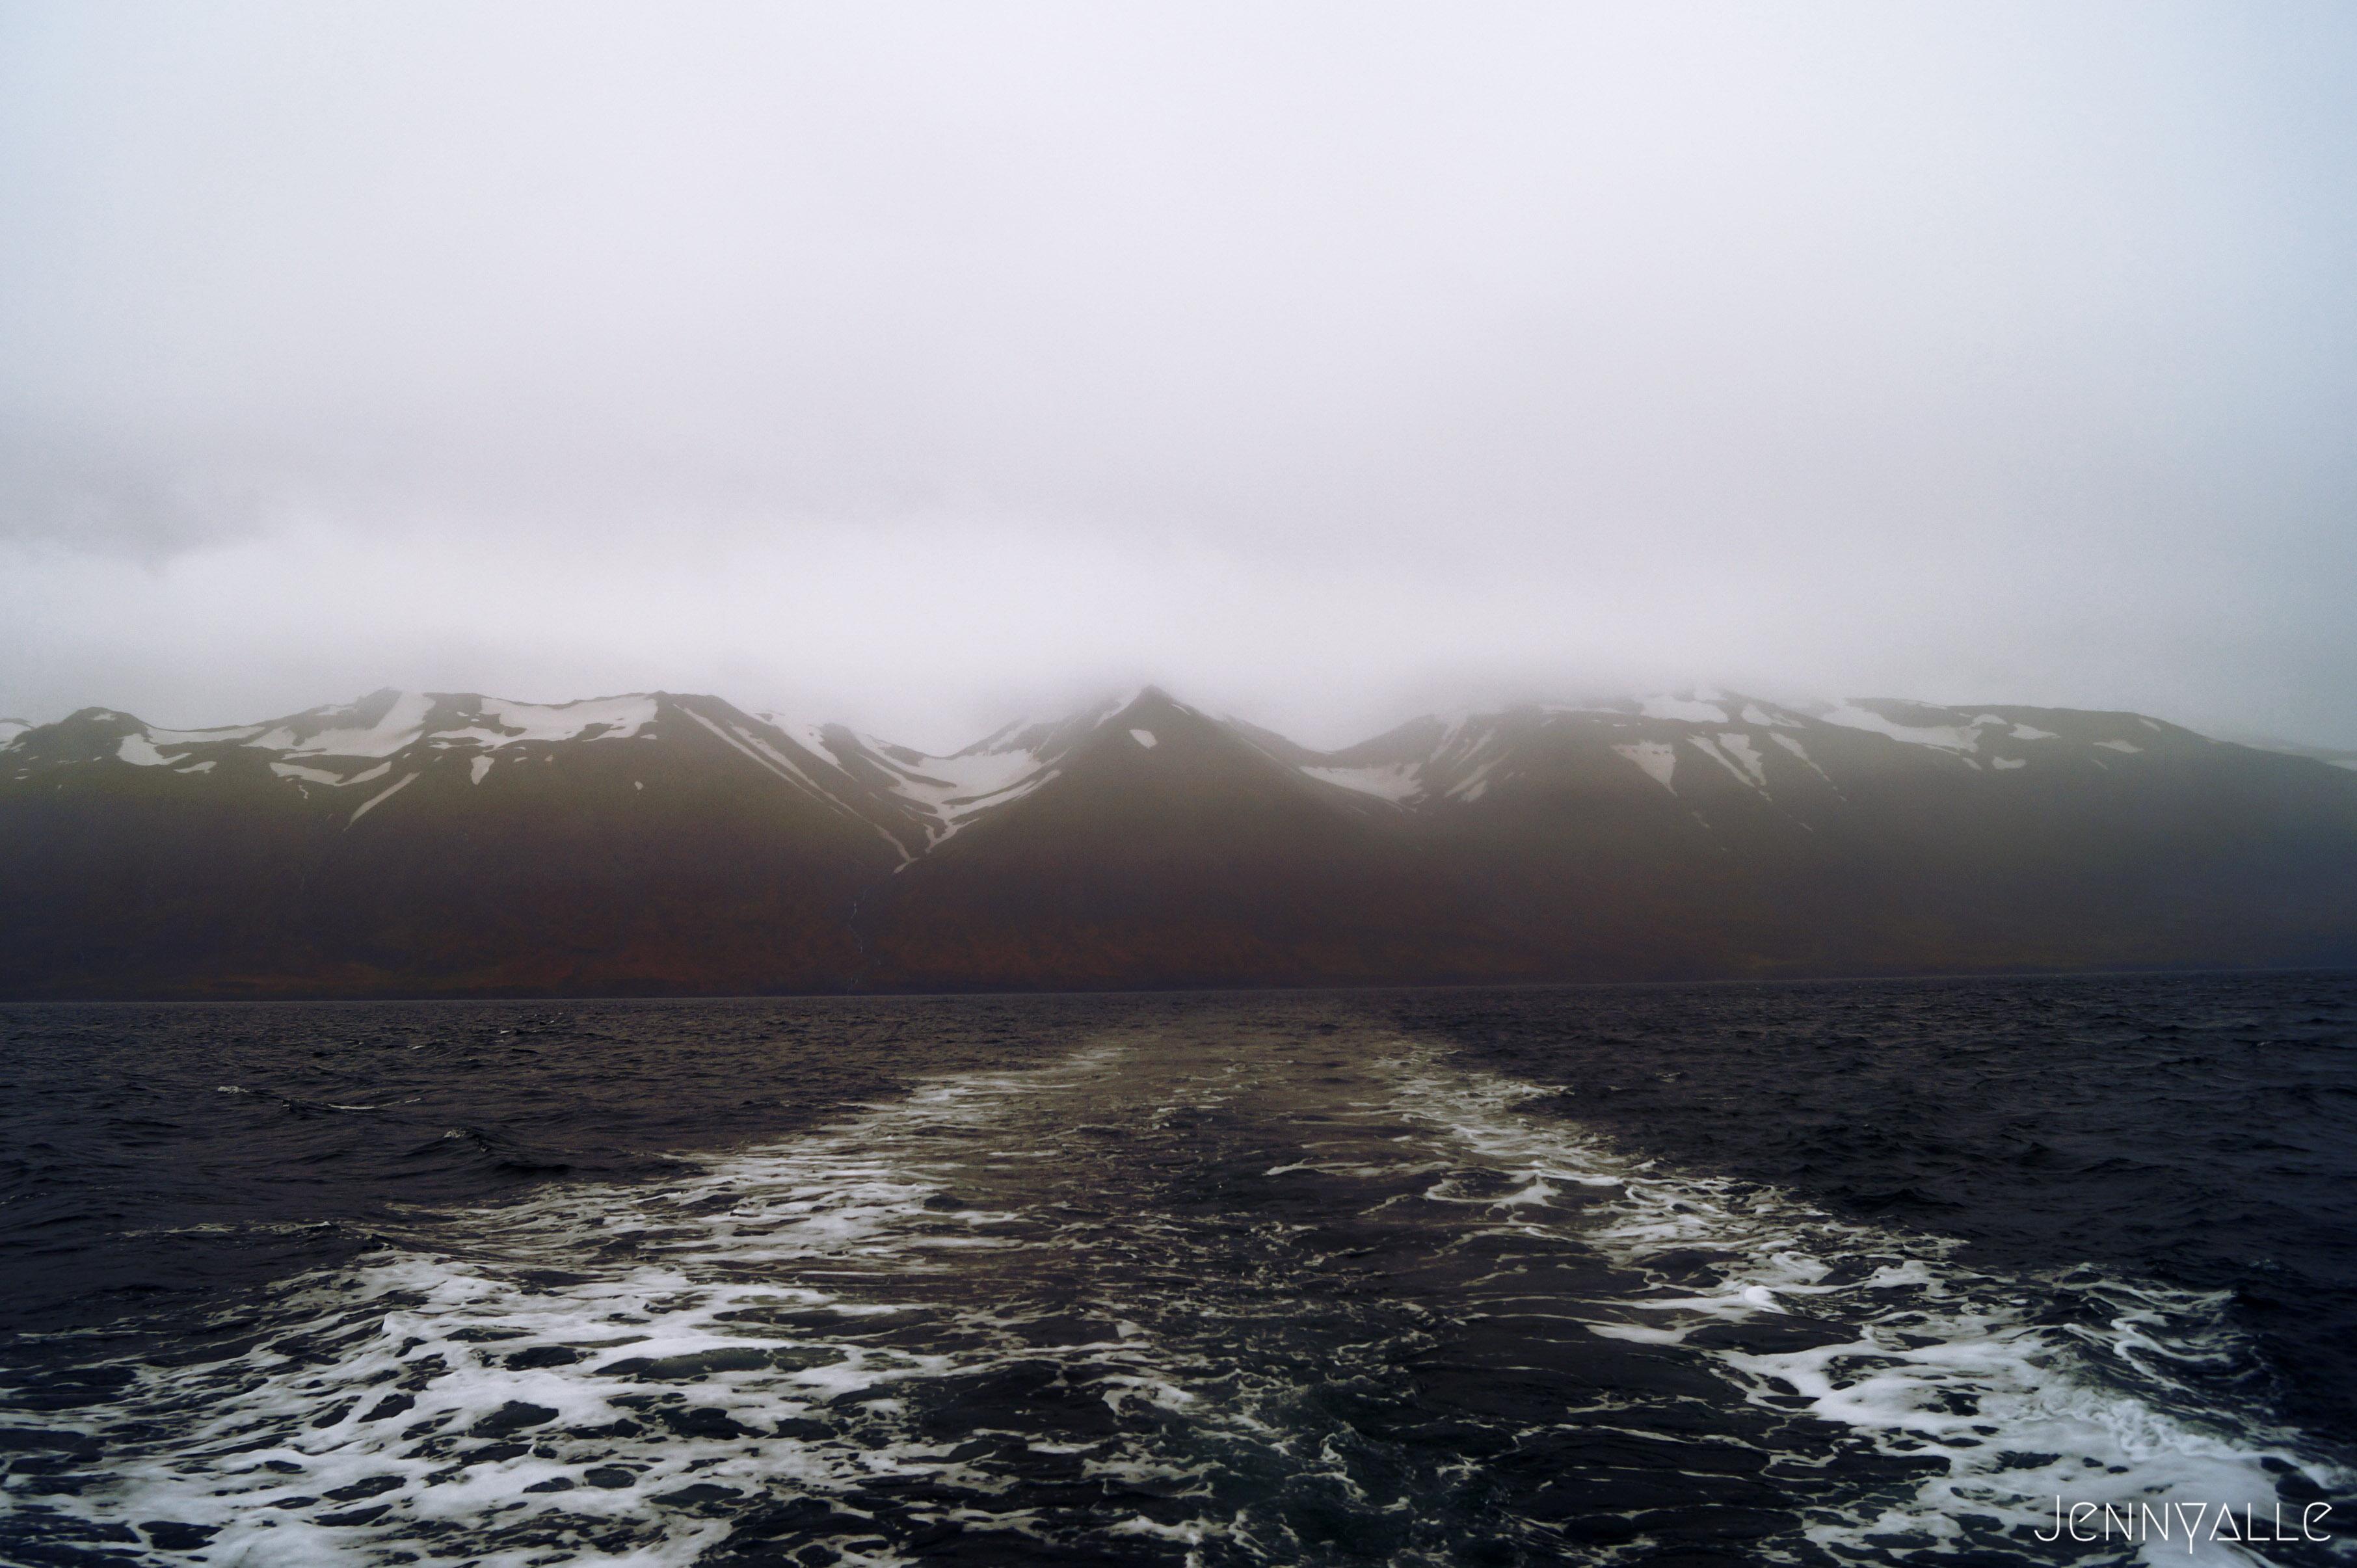 voyage itineraire Islande dalvik Eyjafjordur